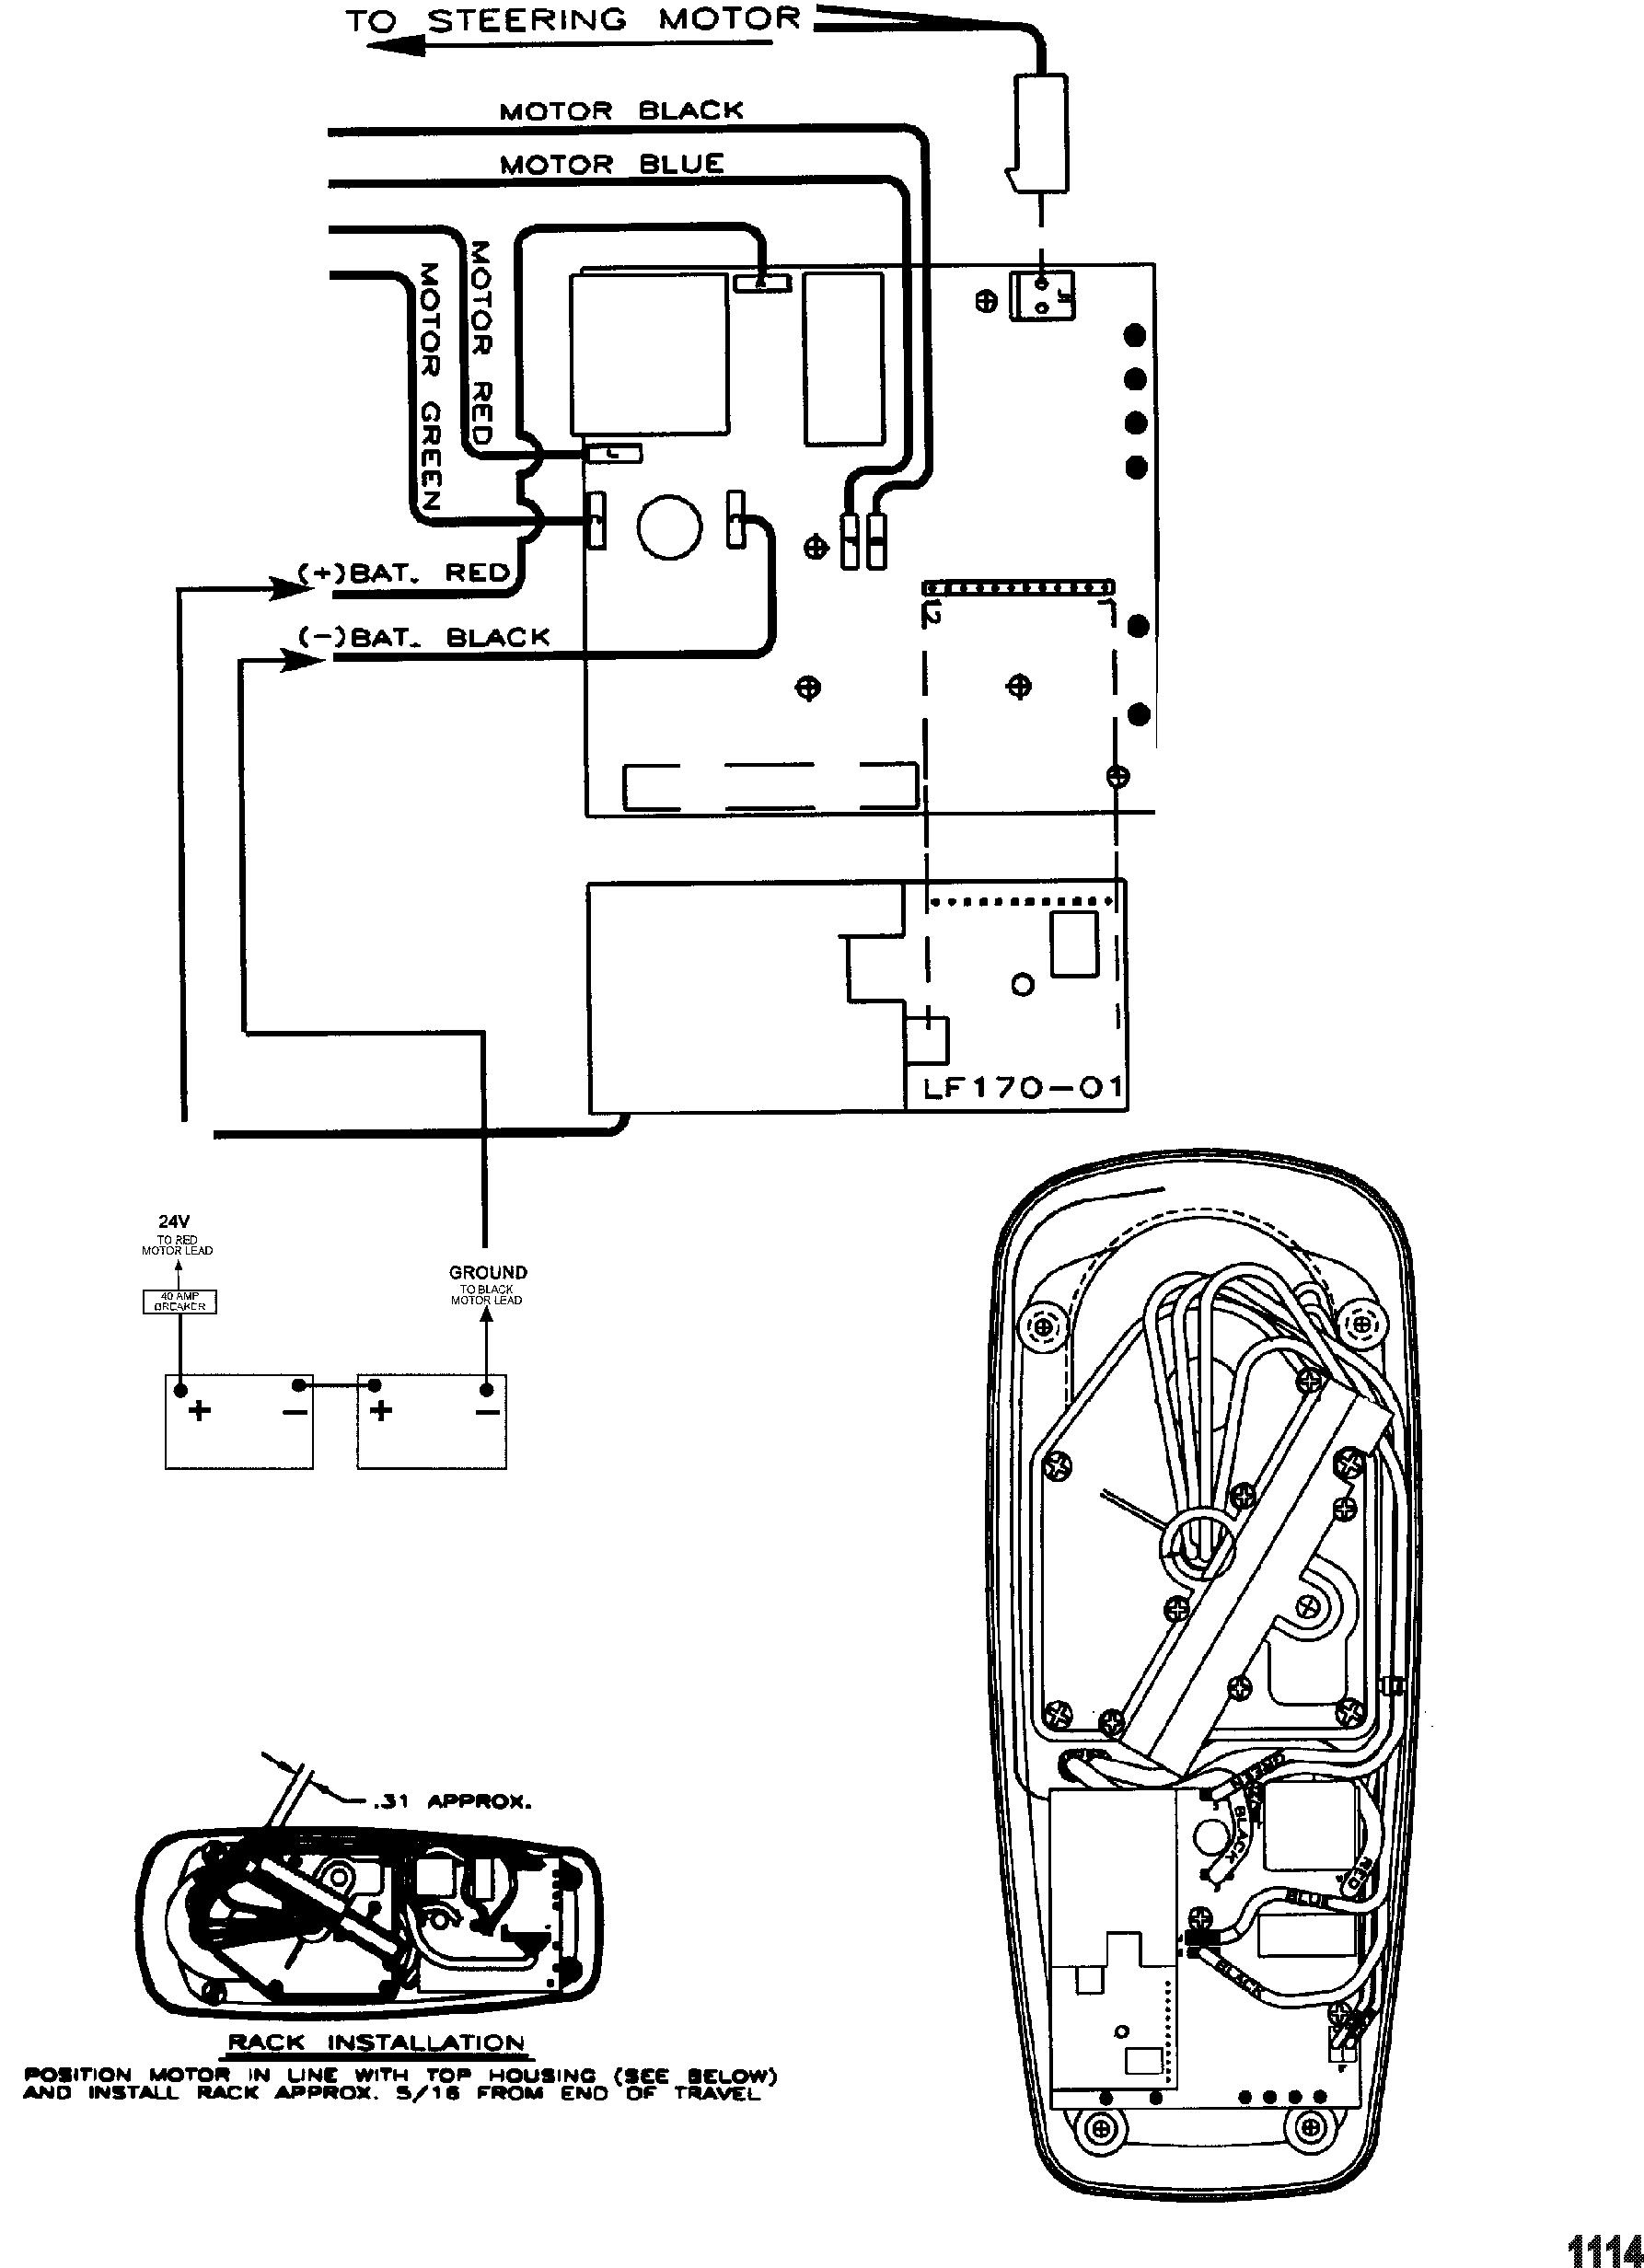 Motorguide Trolling Motor Wiring Diagram from schematron.org